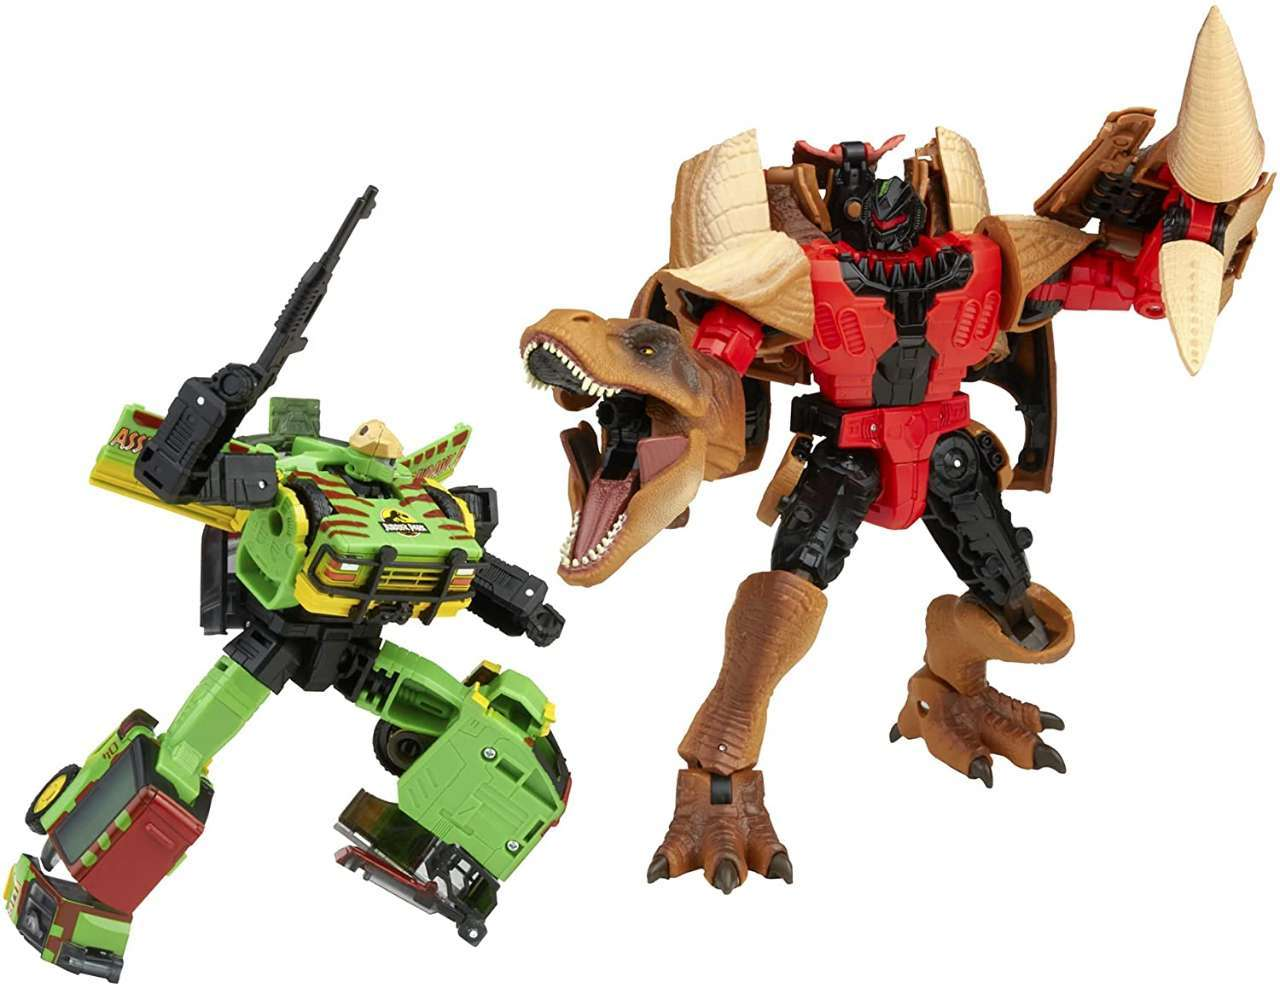 Jurassic Park Transformers